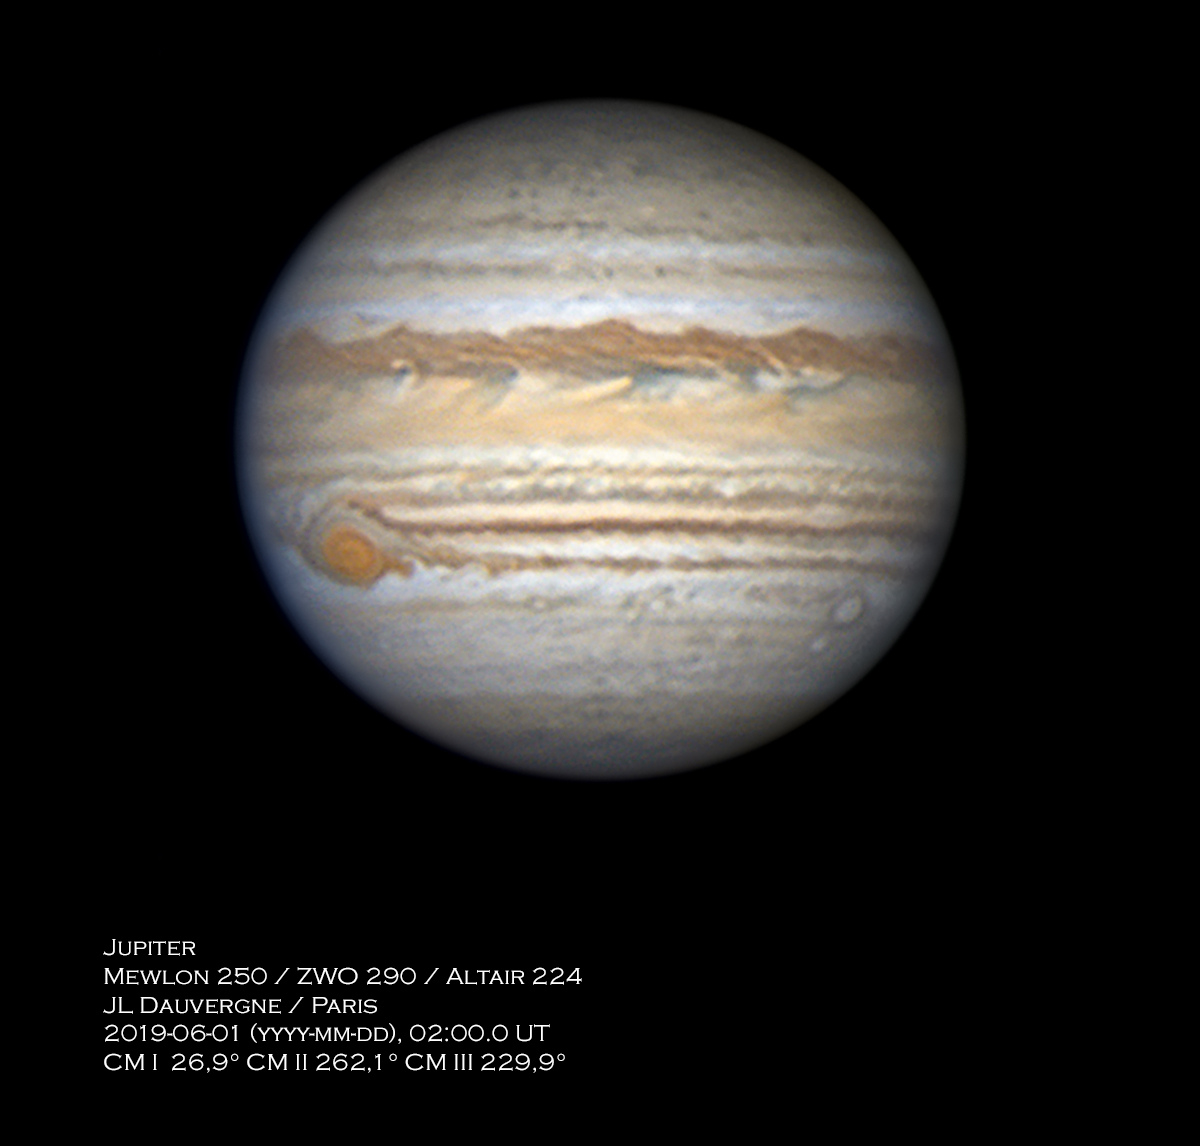 2019-06-01-0200_0-LL-Jupiter_ALTAIRGP224C_lapl6_ap119.png.jpg.ce22659602a57510de77fffae8fe99b4.jpg